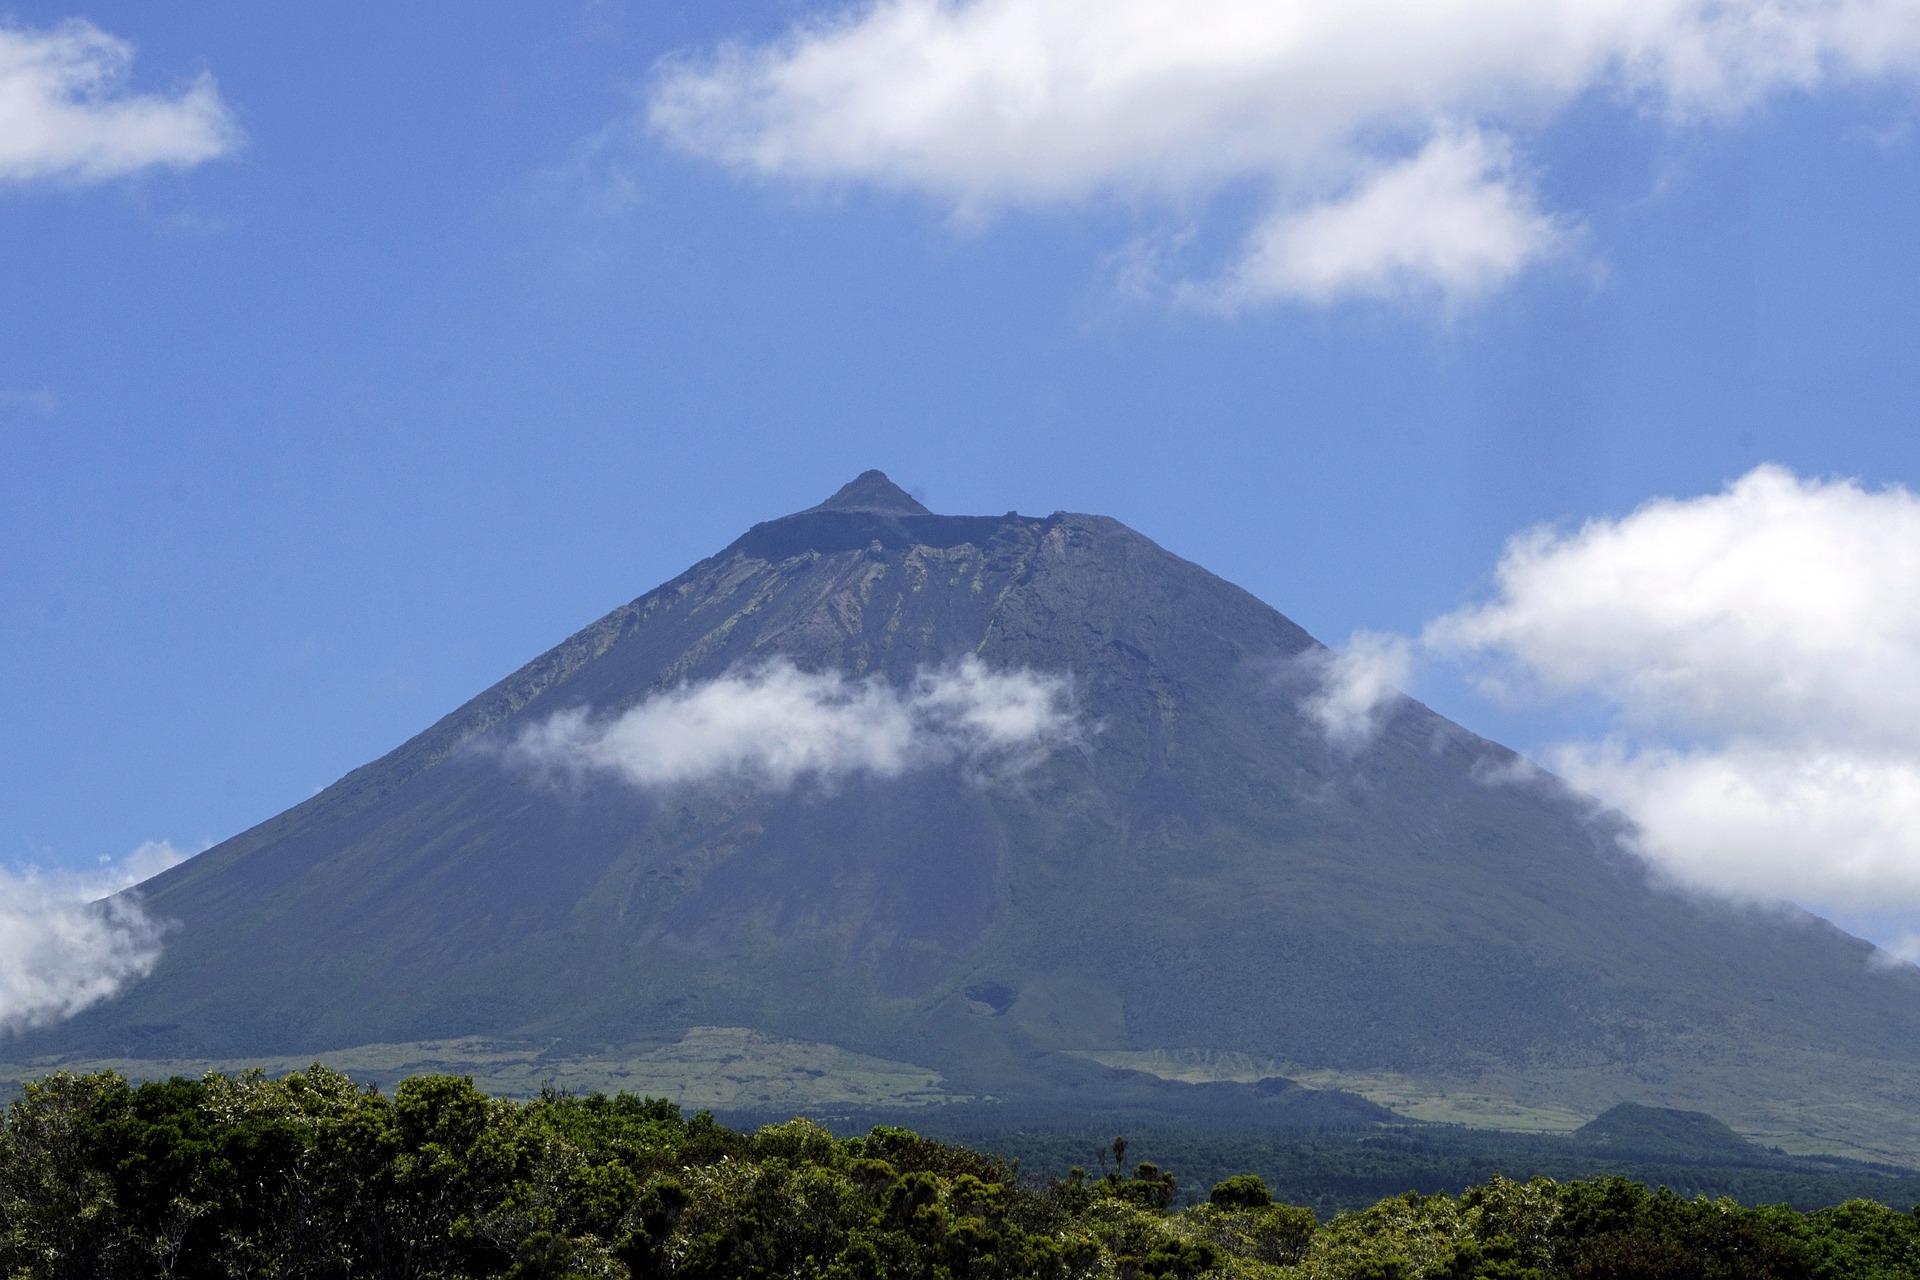 Der Vulkan Pico auf der Insel Pico